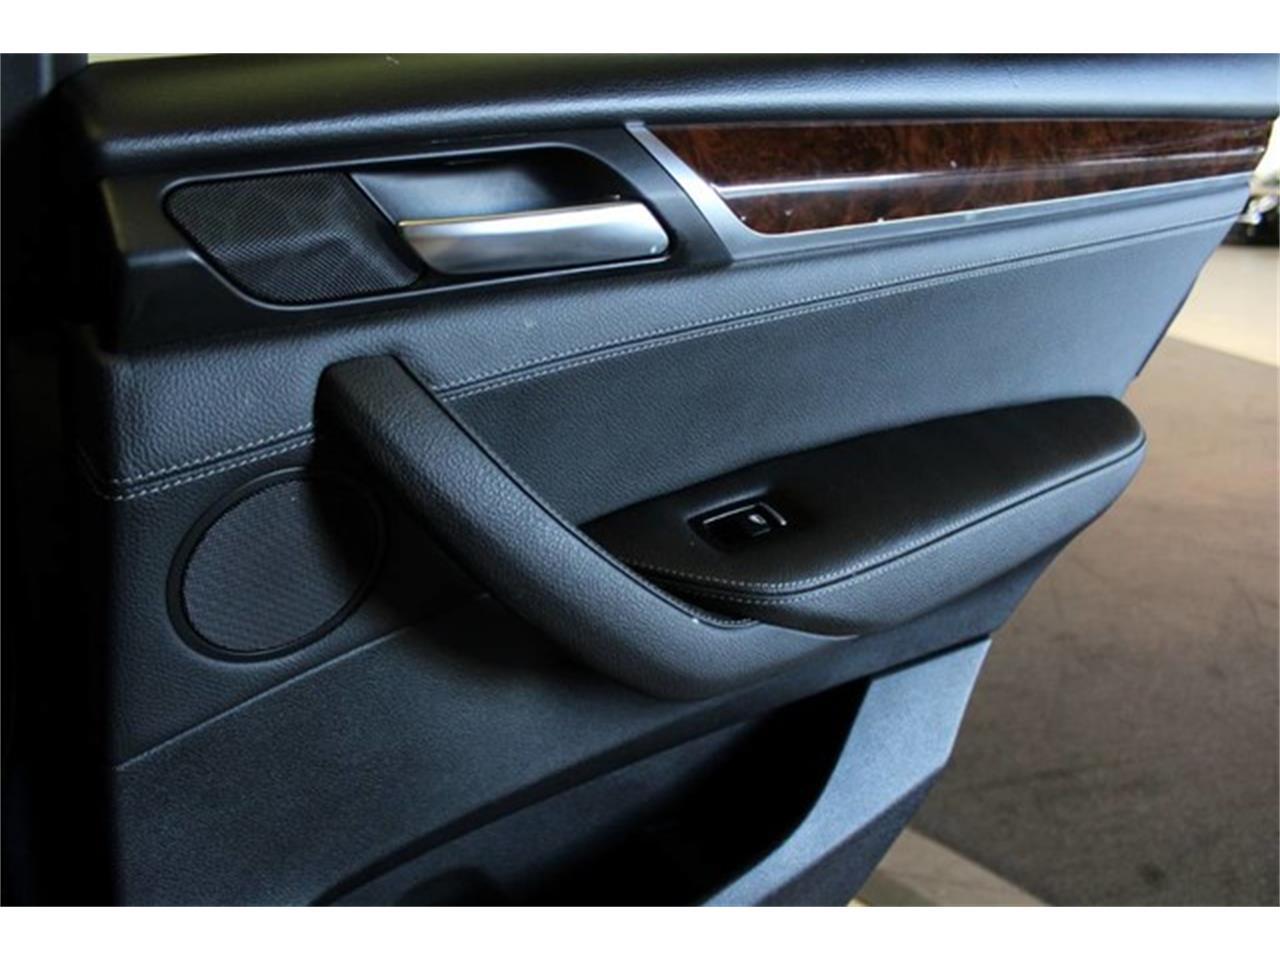 2016 BMW X3 (CC-1210228) for sale in Anaheim, California